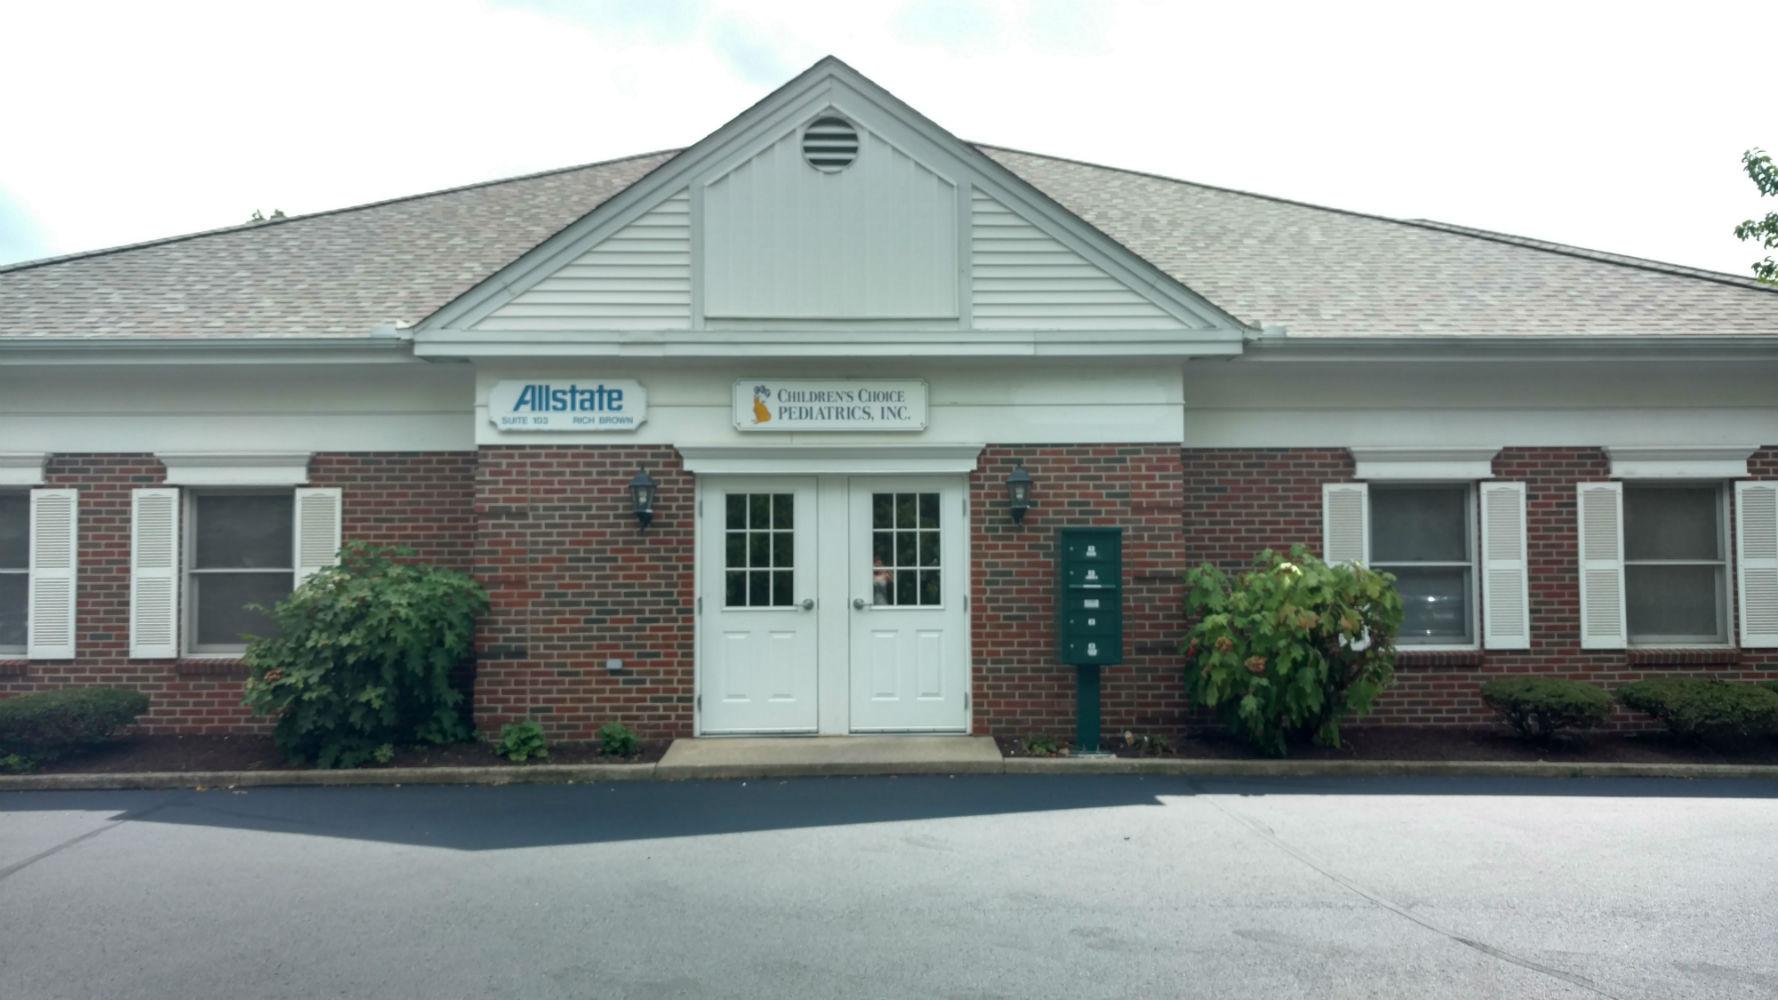 Richard W. Brown: Allstate Insurance image 0